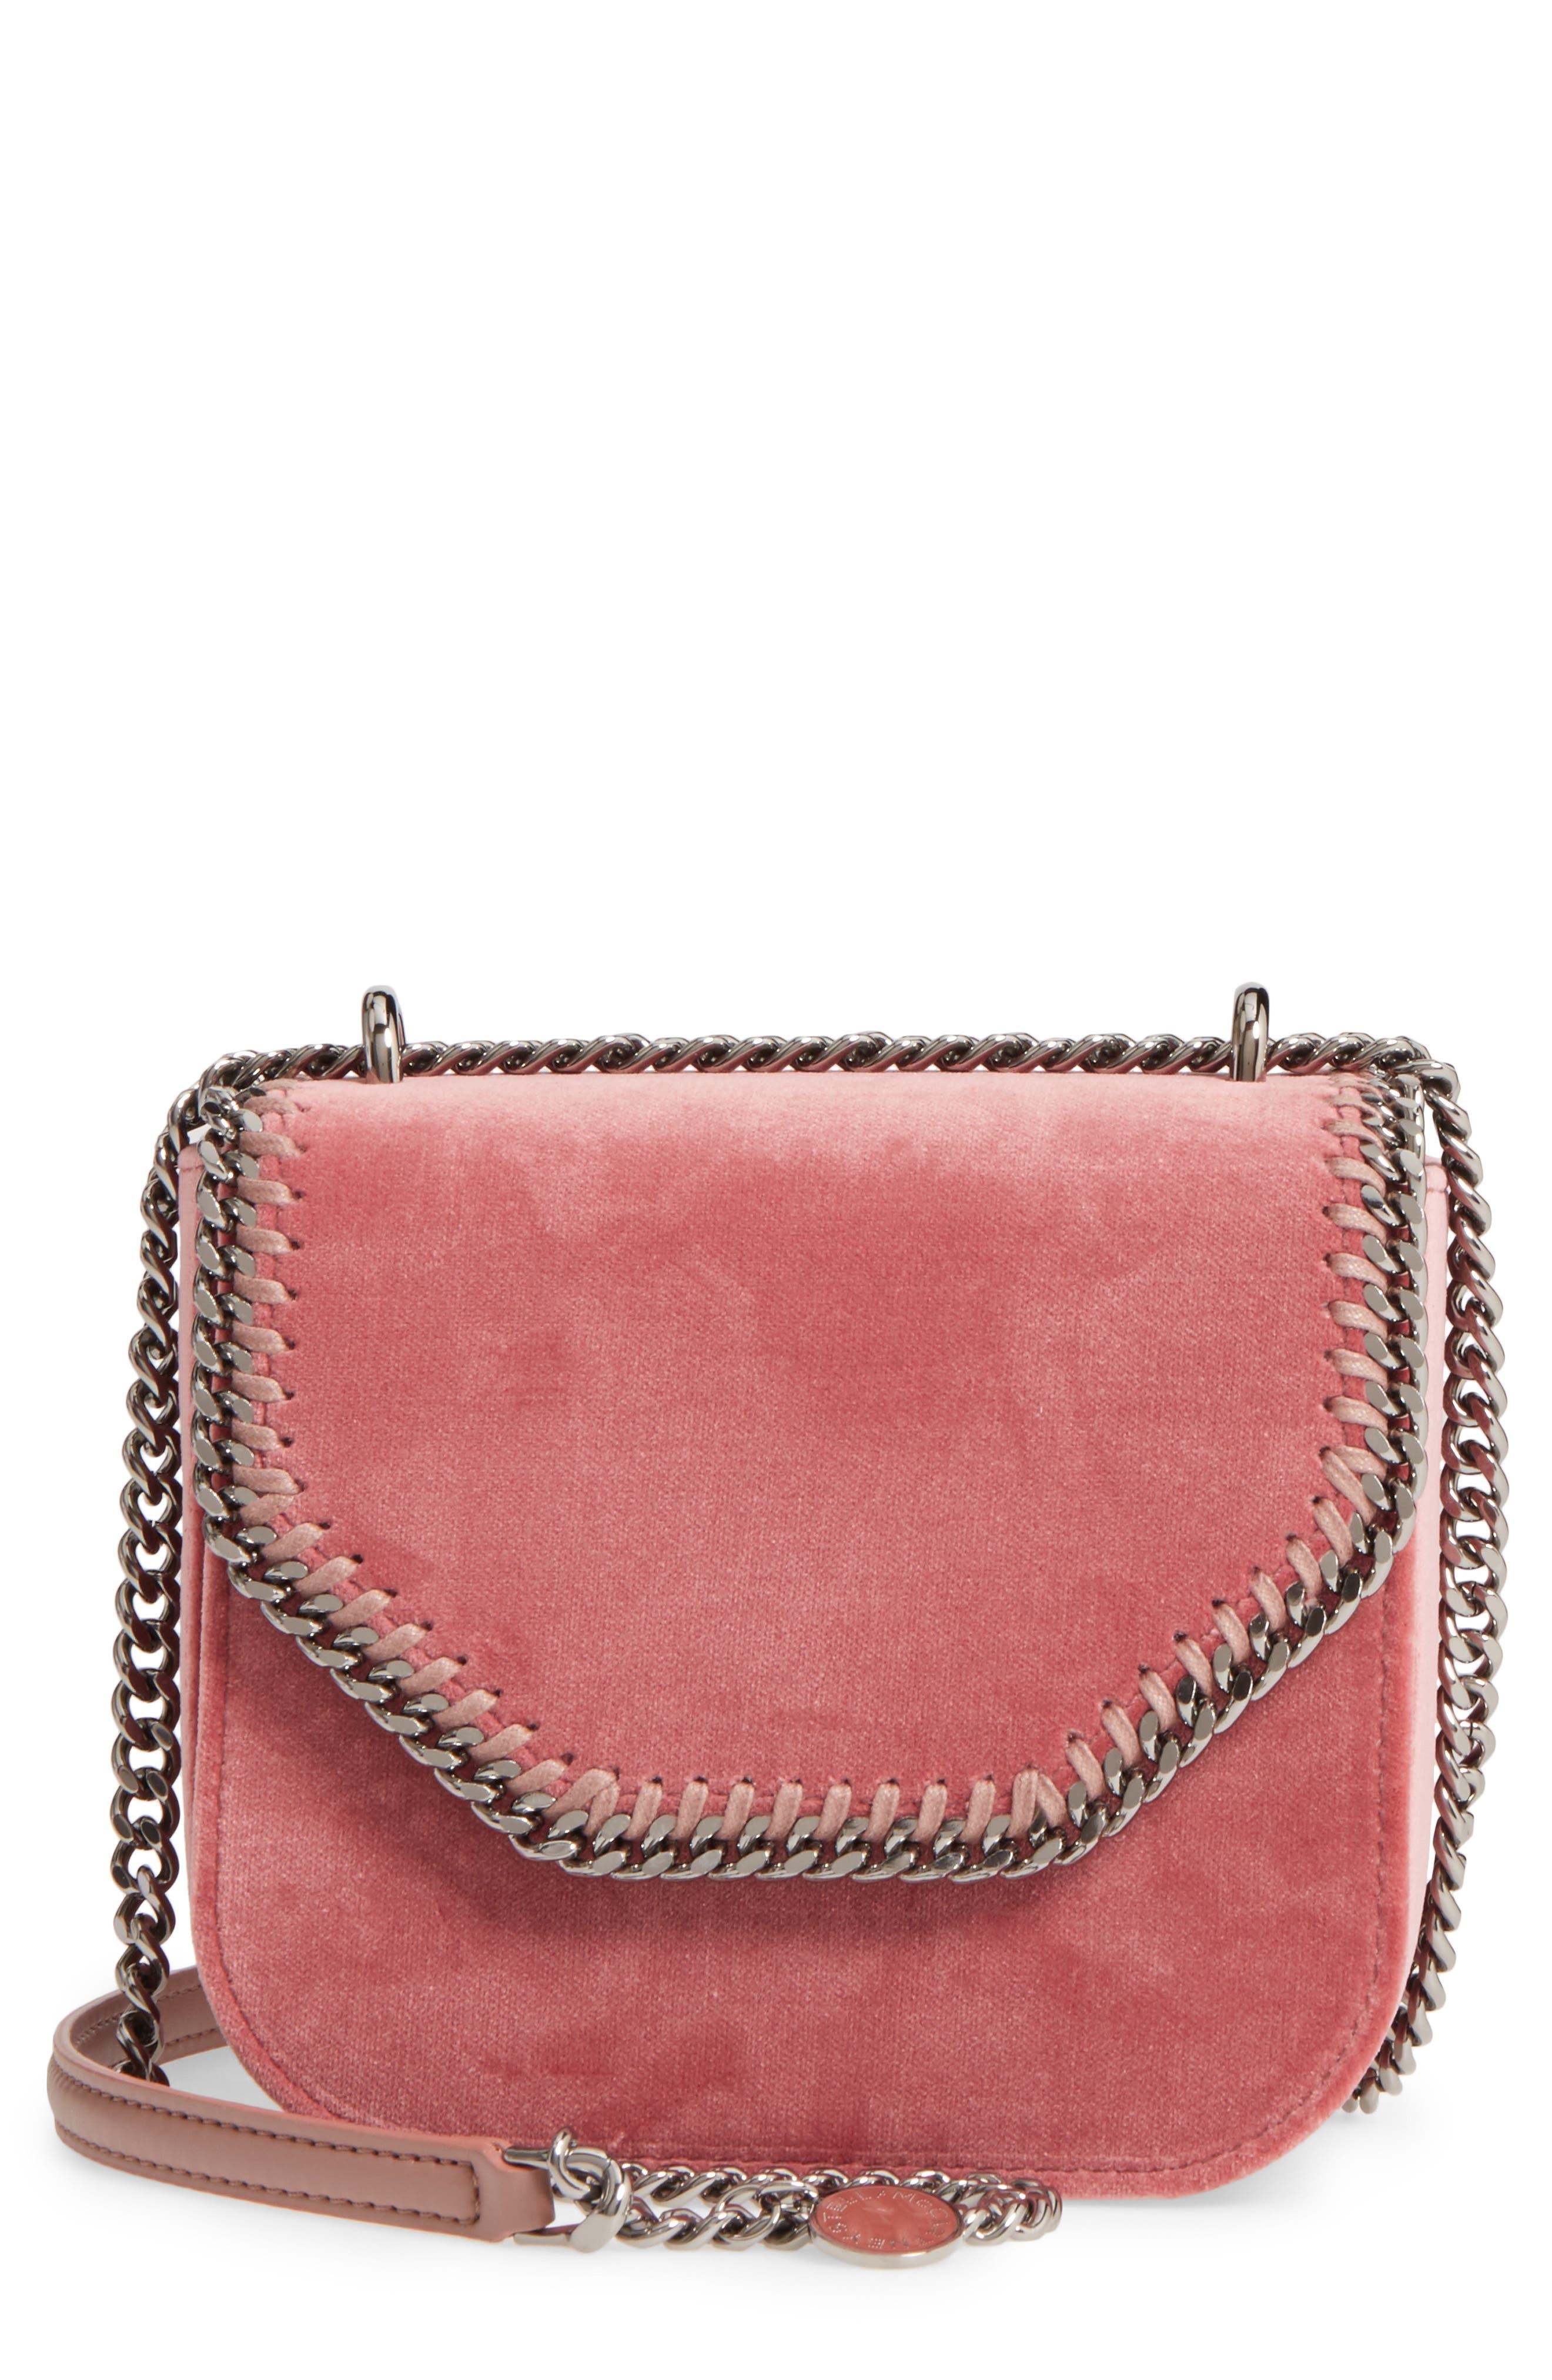 Alternate Image 1 Selected - Stella McCartney Mini Falabella Box Velvet Shoulder Bag